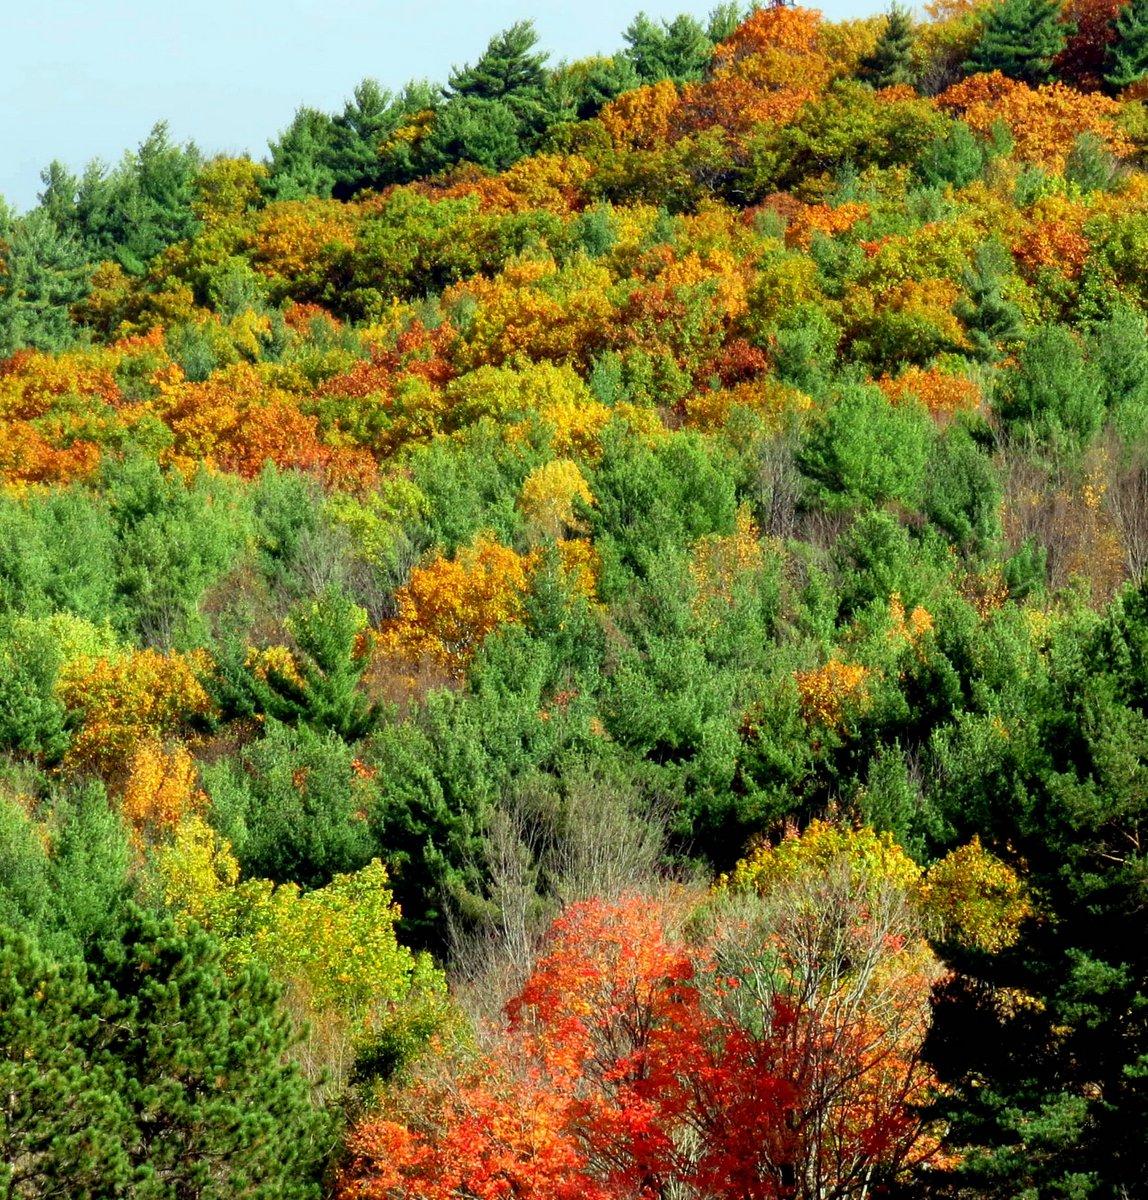 6. Hillside Foliage